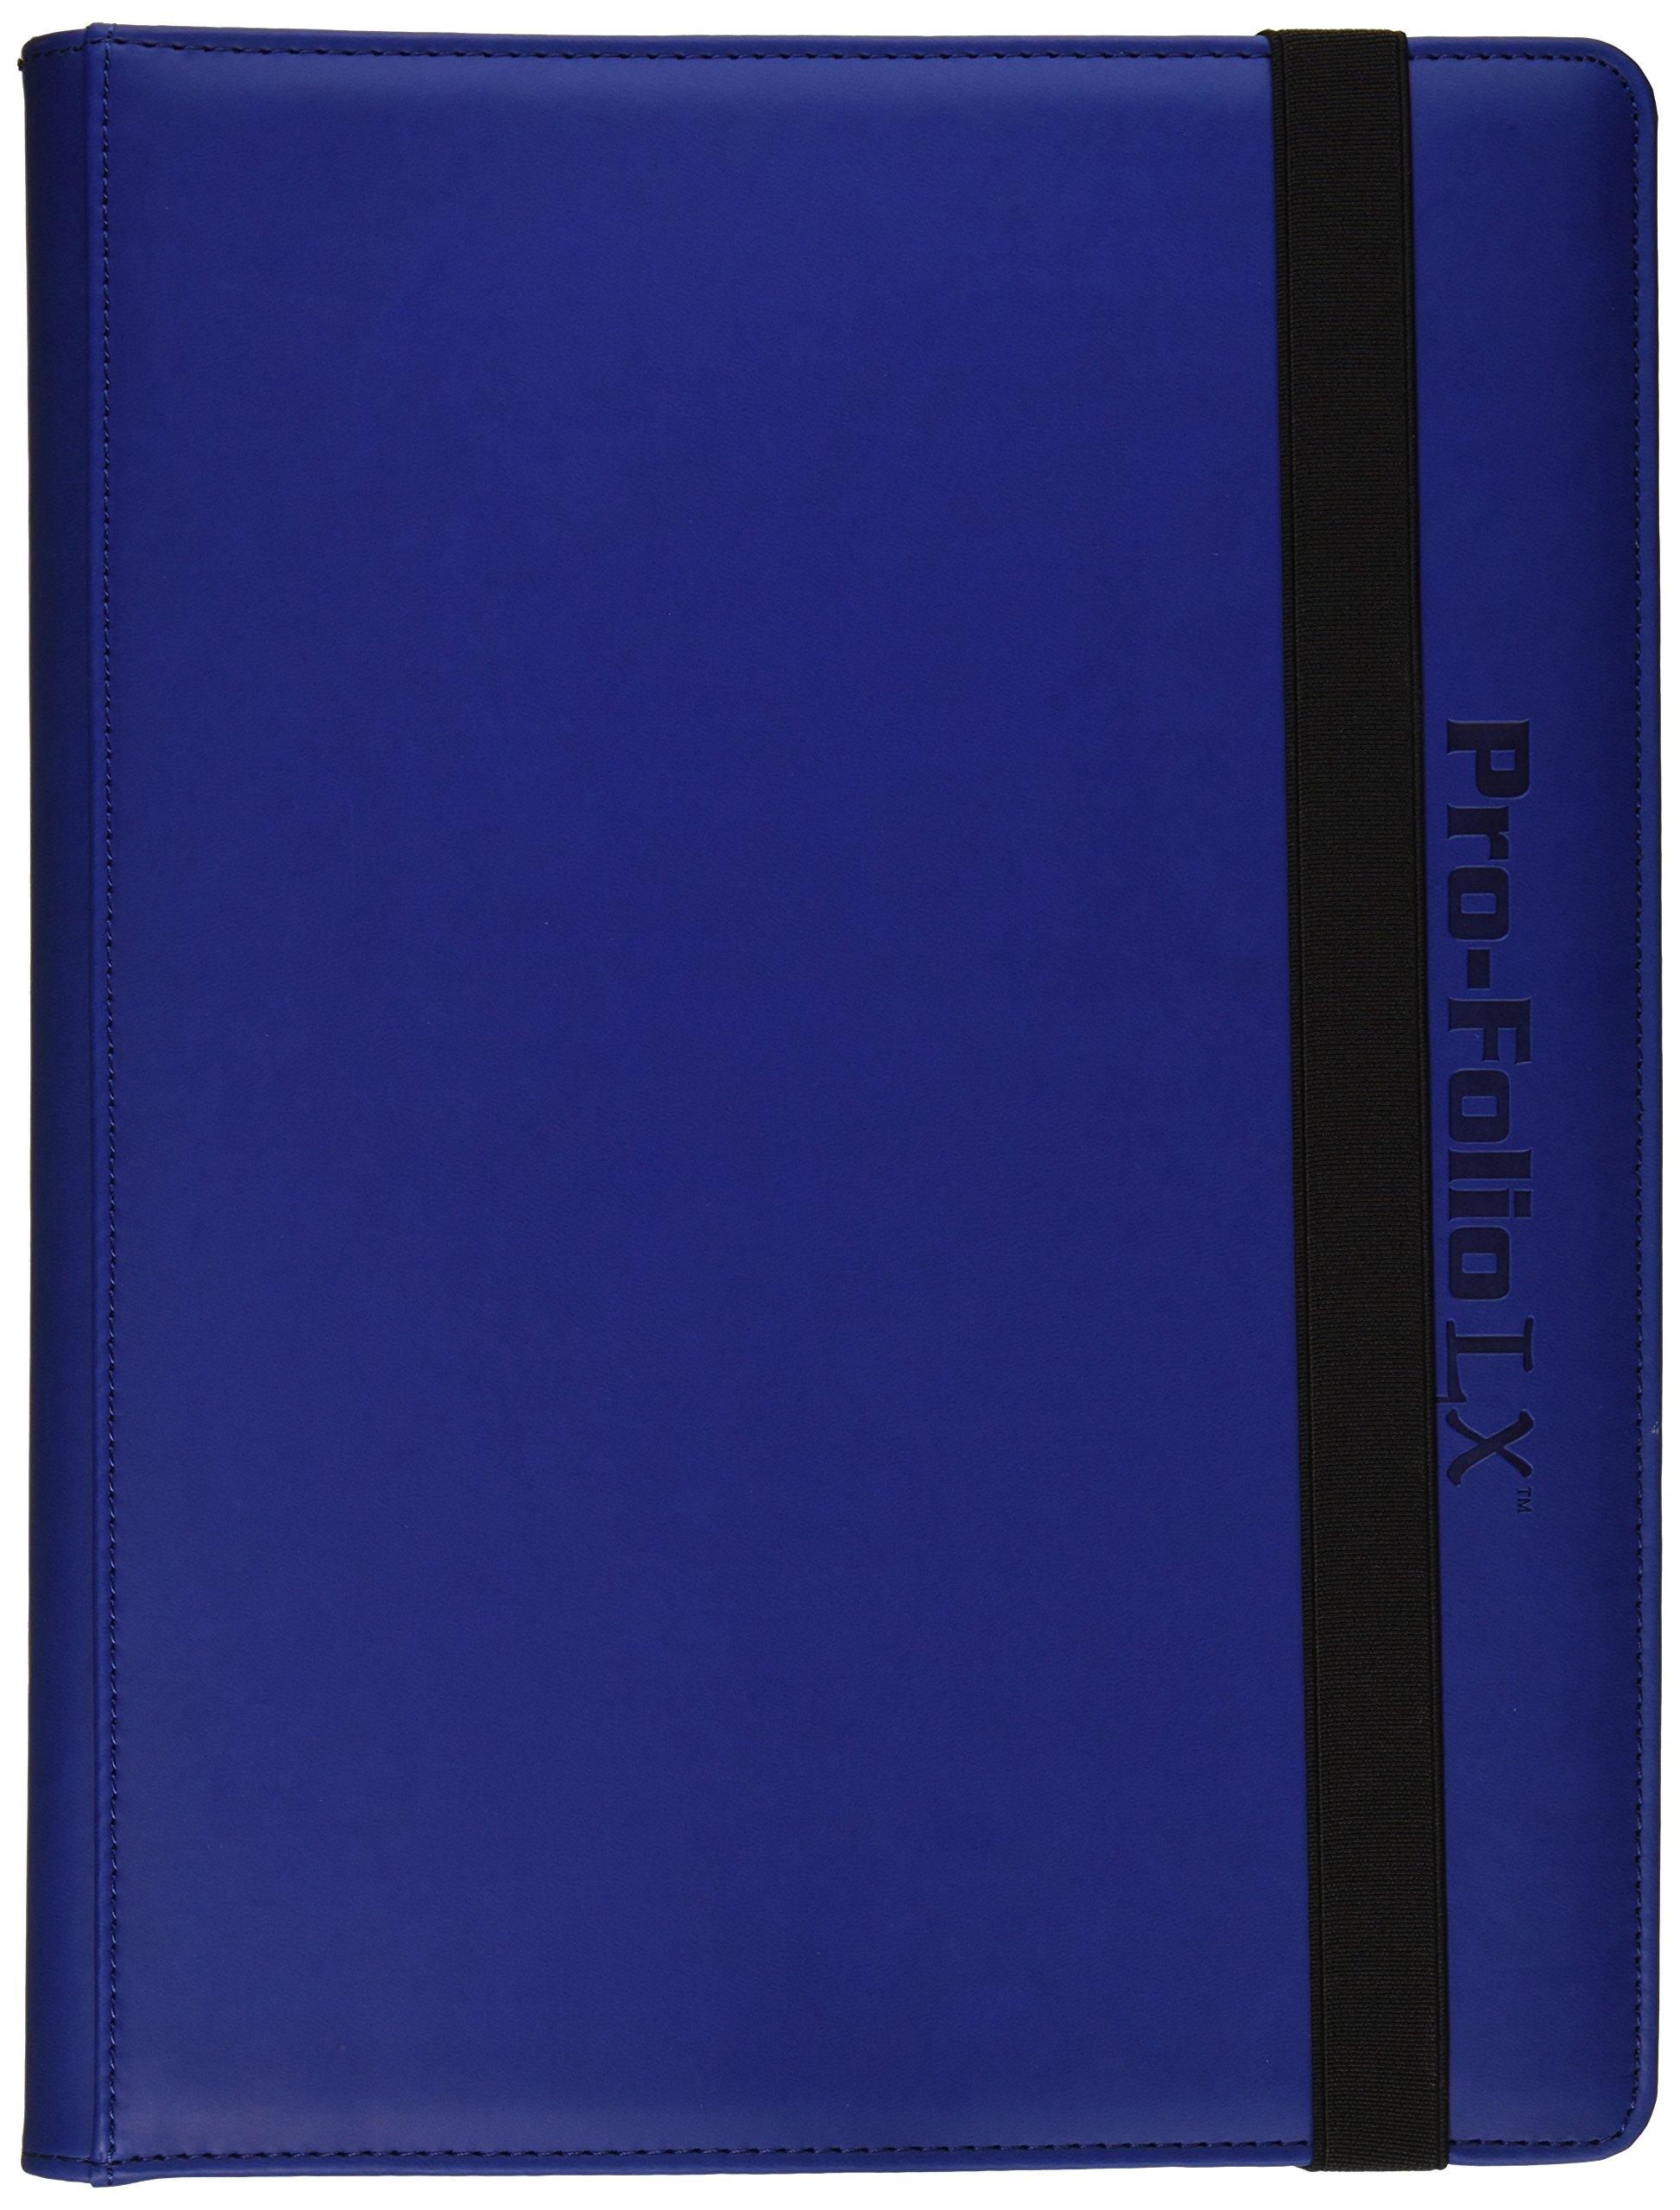 Pro-Folio 9-Pocket LX Album, Blue